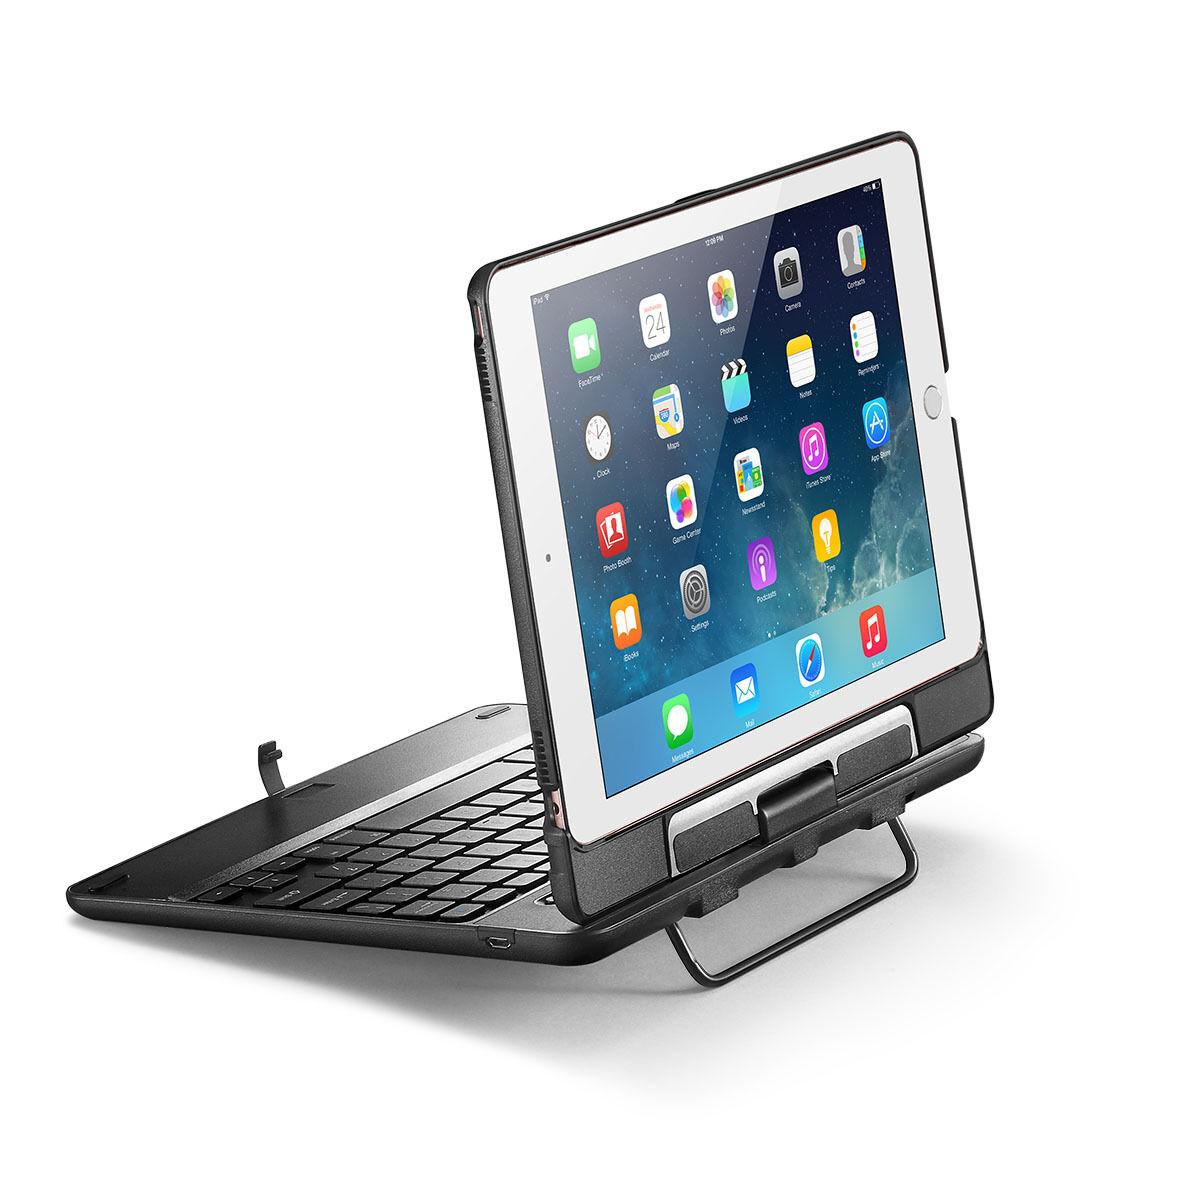 iPad Pro Keyboard Case, New Trent Airbender SmartPro Detacha